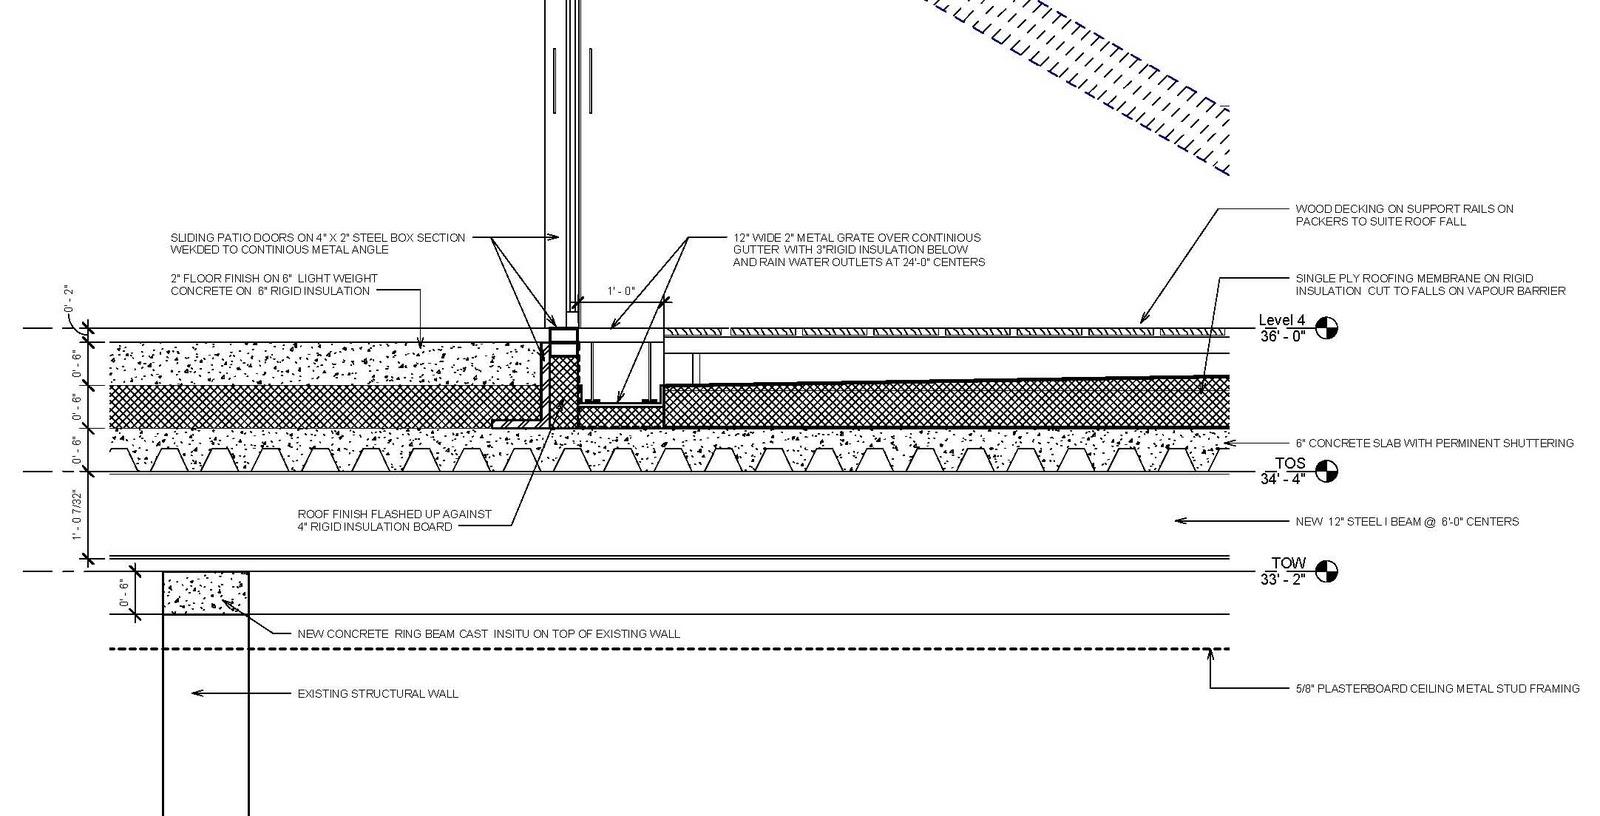 Hard Floor Flooring Details : Revit detail sun shade roof patio inner gutter